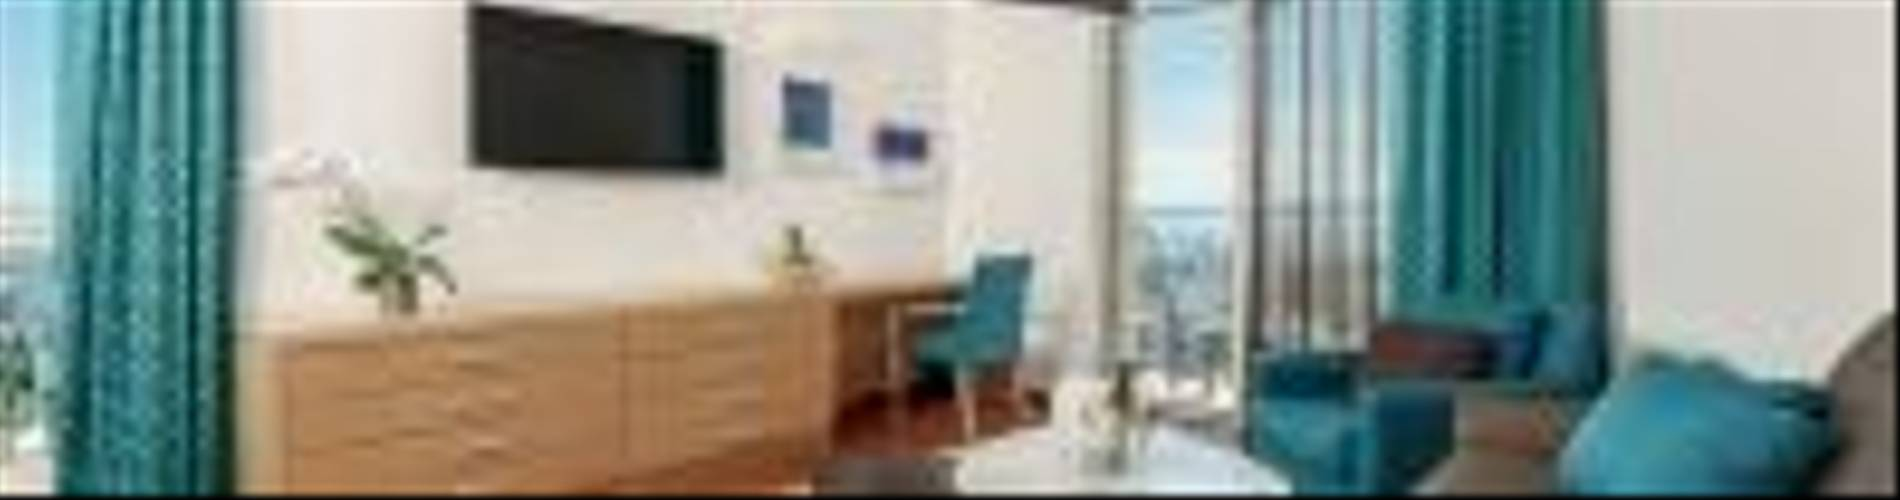 HotelResidence_DIOKLECIJAN_room-livingRoom-interier-panorama_2048px_DSC03825-198x120.jpg